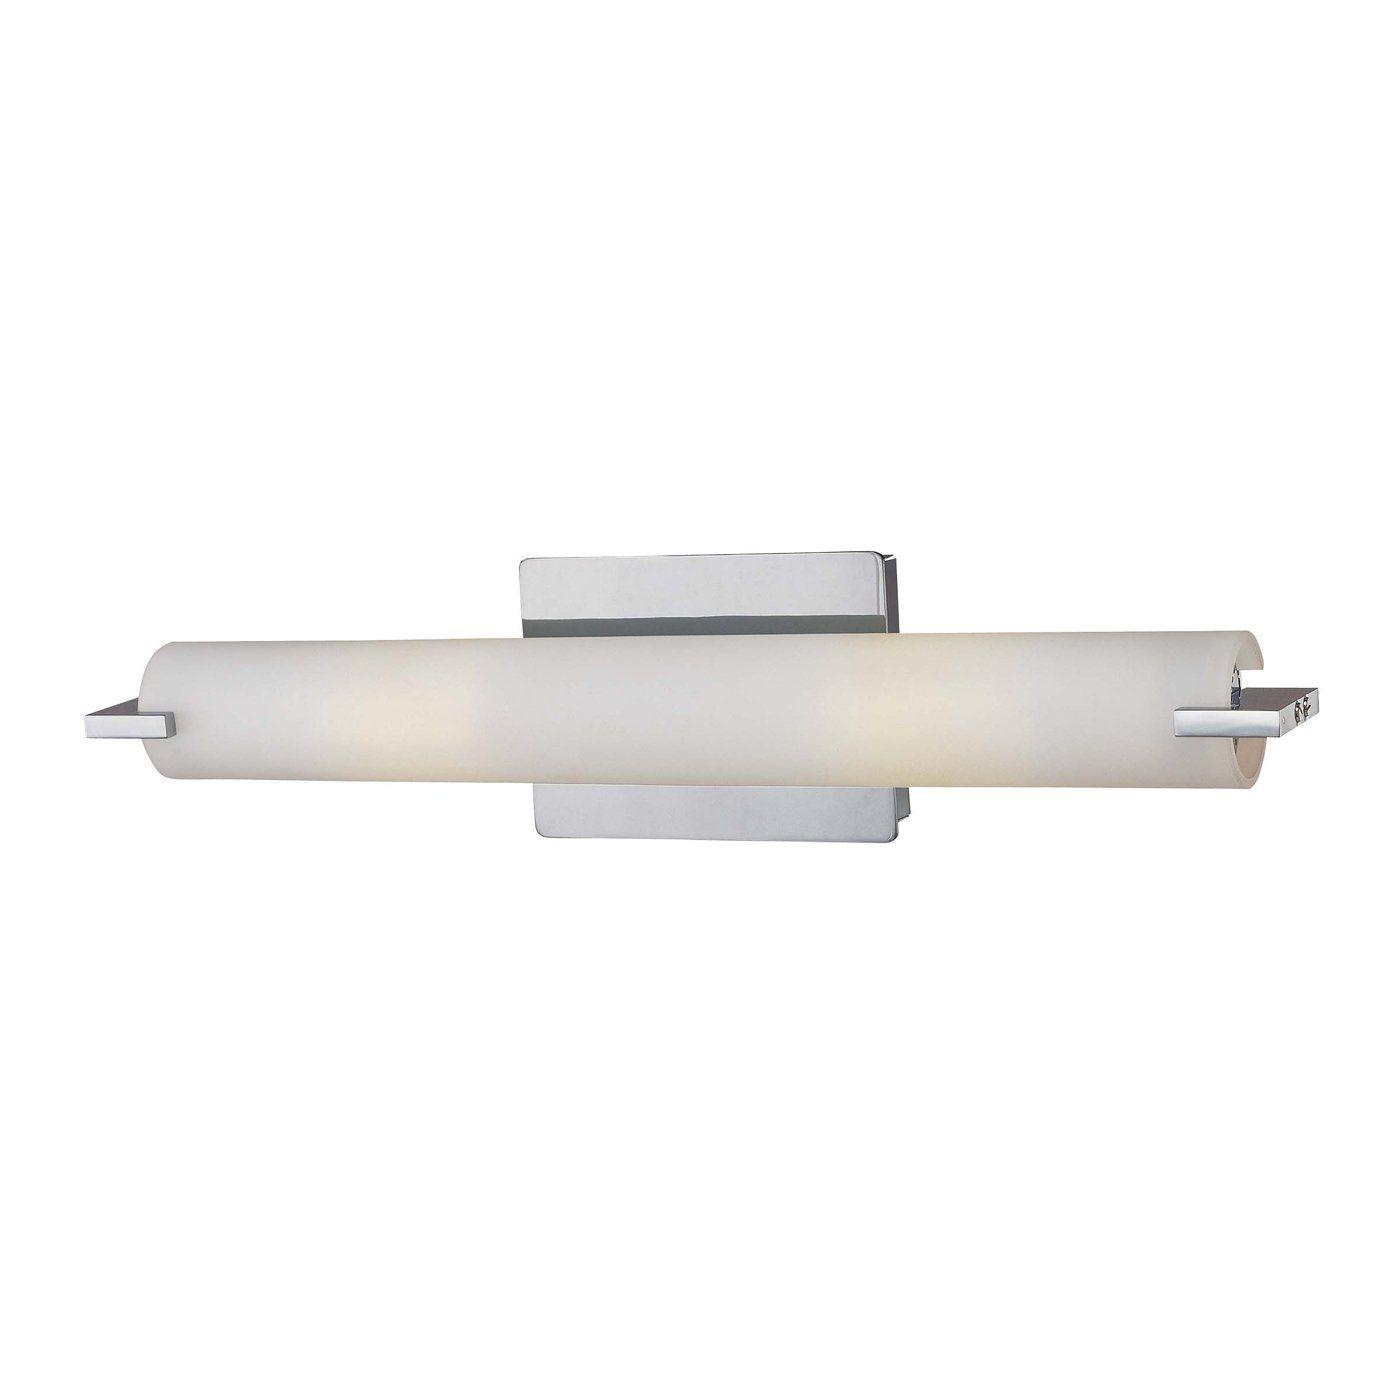 George Kovacs P5044 077 Pl 2 Light Tube Fluorescent Bathroom Light